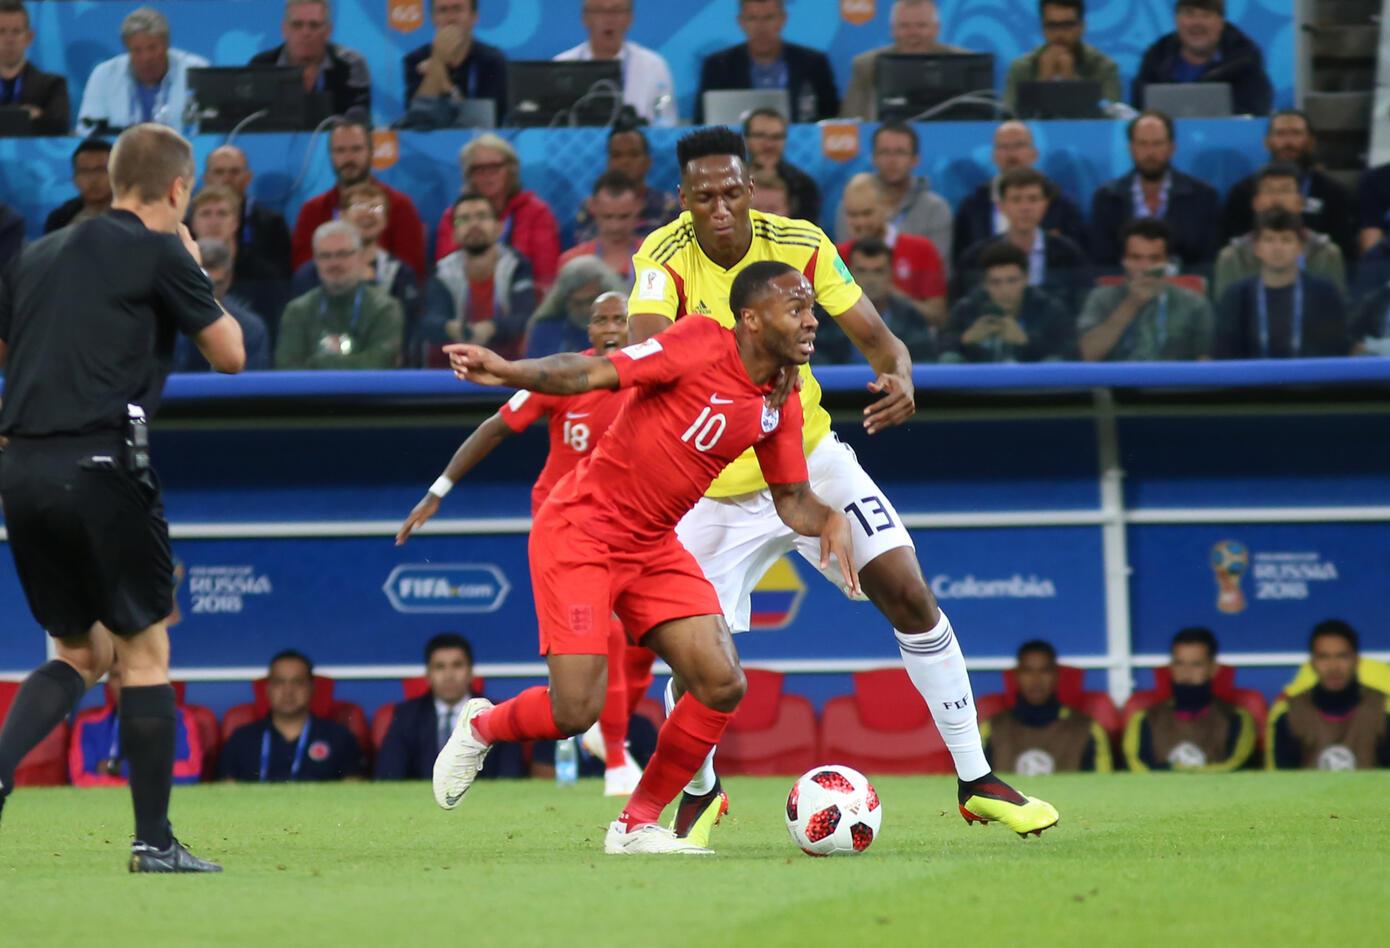 Colombia Inglaterra Rusia 2018 2